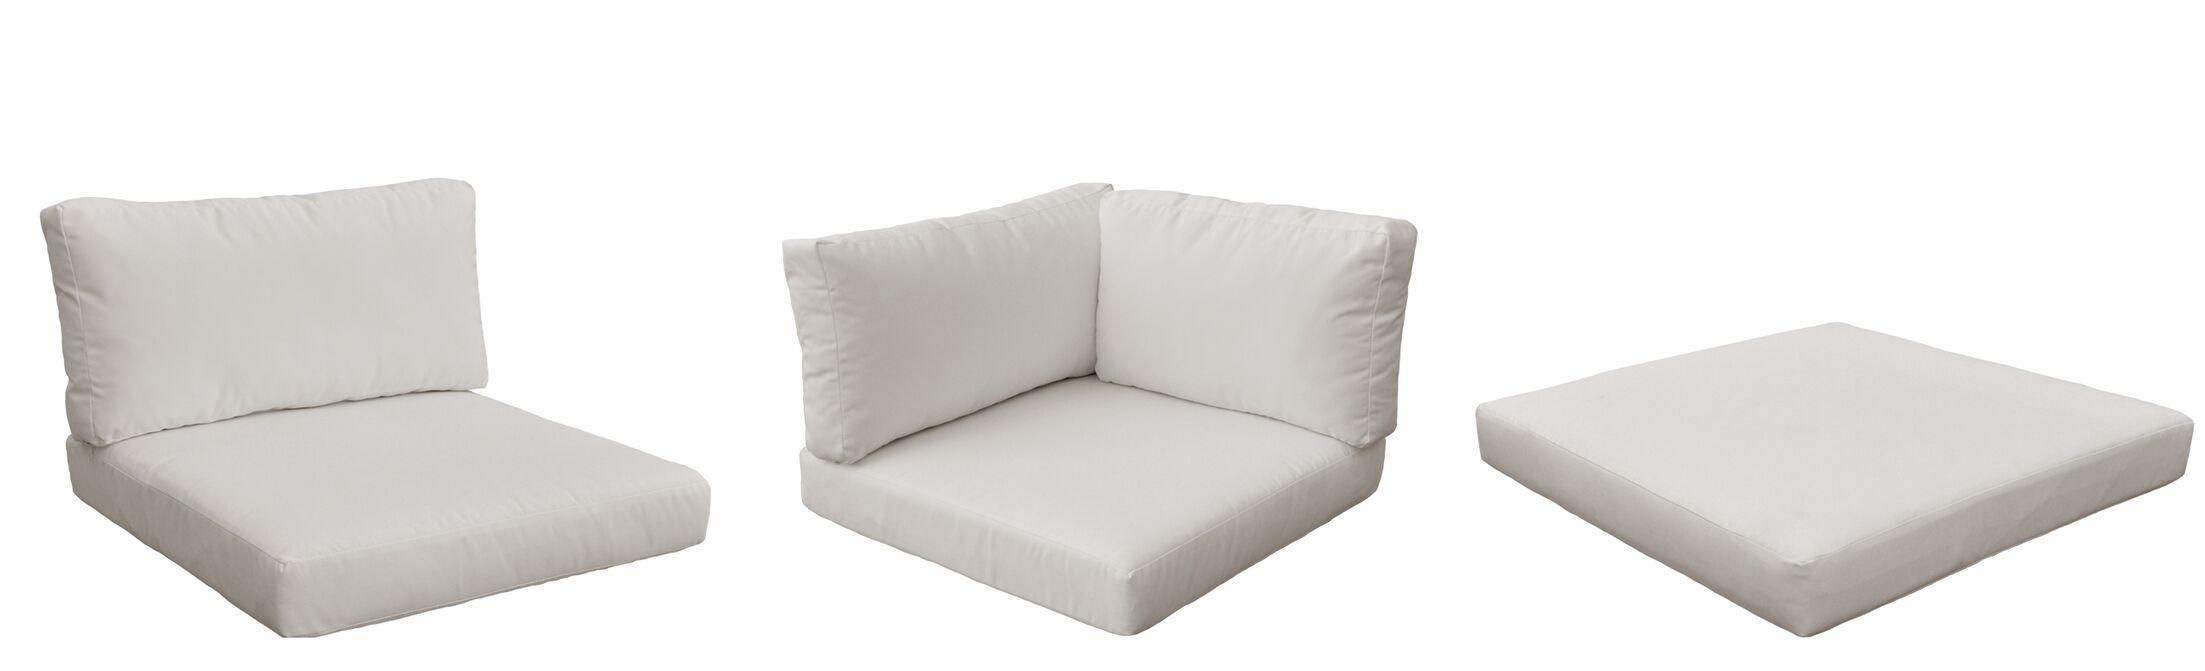 Monterey Outdoor 23 Piece Lounge Chair Cushion Set Fabric: Beige